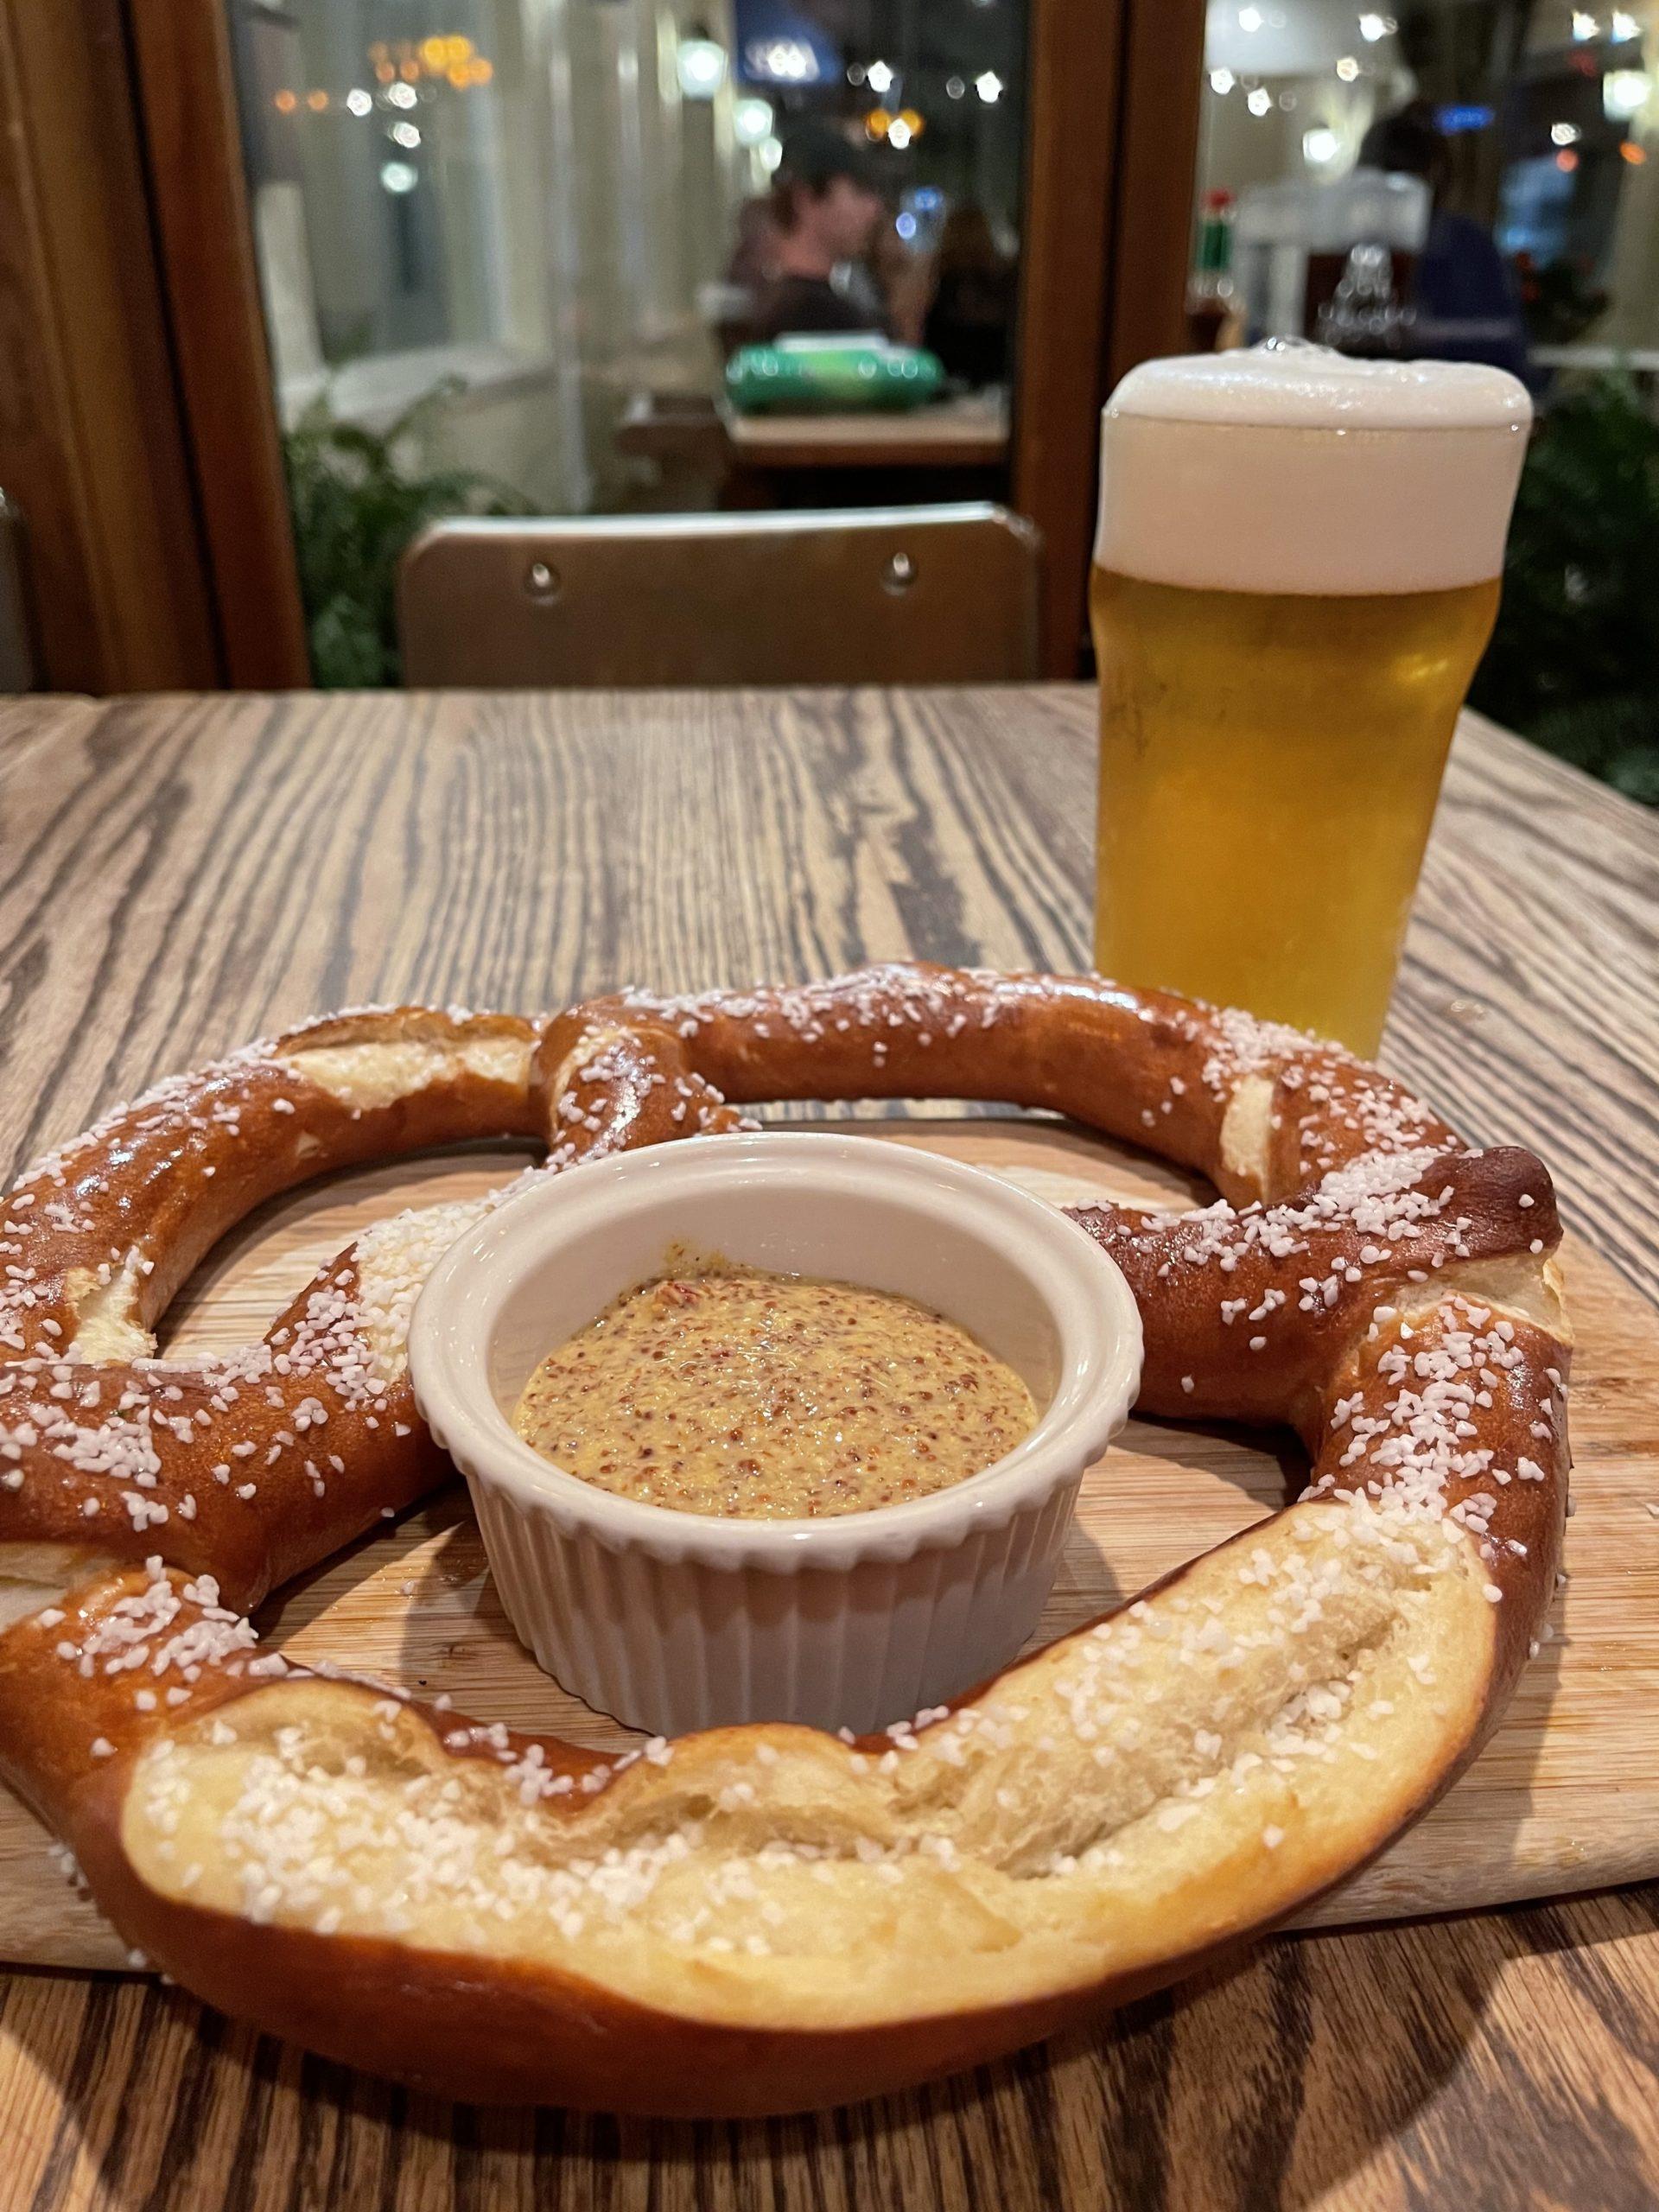 Enjoy a Bavarian pretzel and a beer at Rowdy Hall for Oktoberfest.